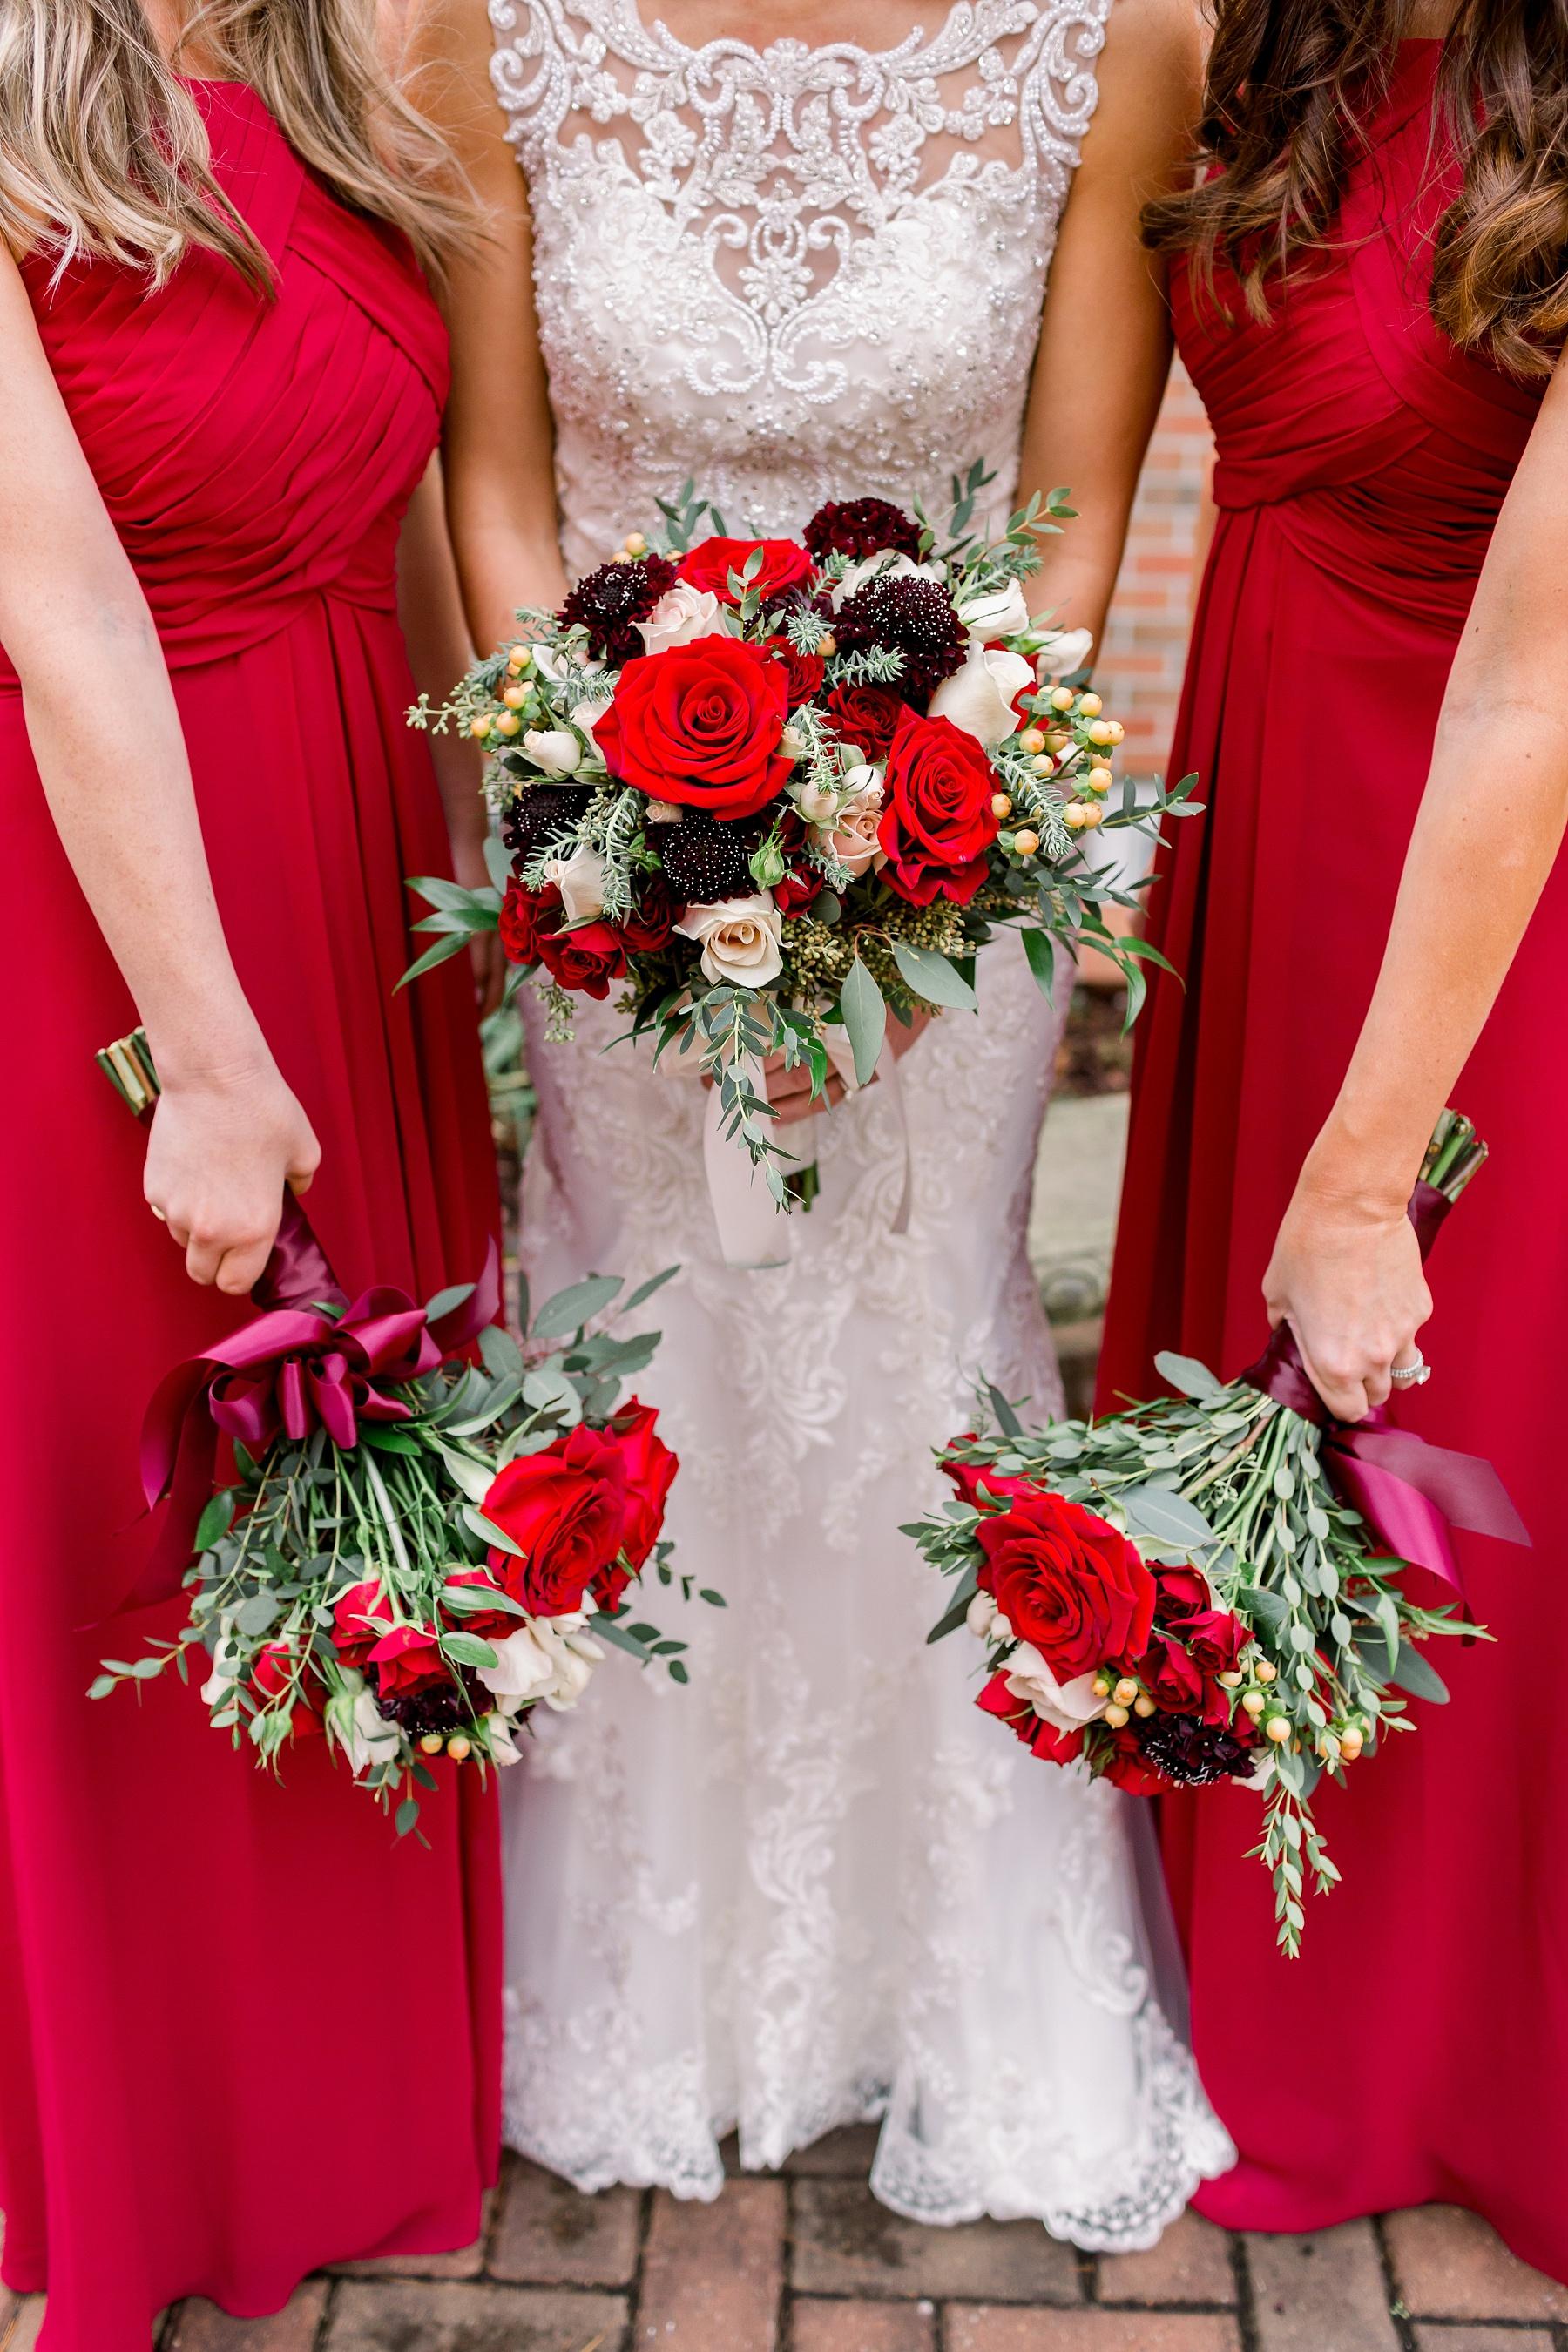 midwest-adventurous-wedding-photographer-elizabeth-ladean-photography-photo_4826.jpg